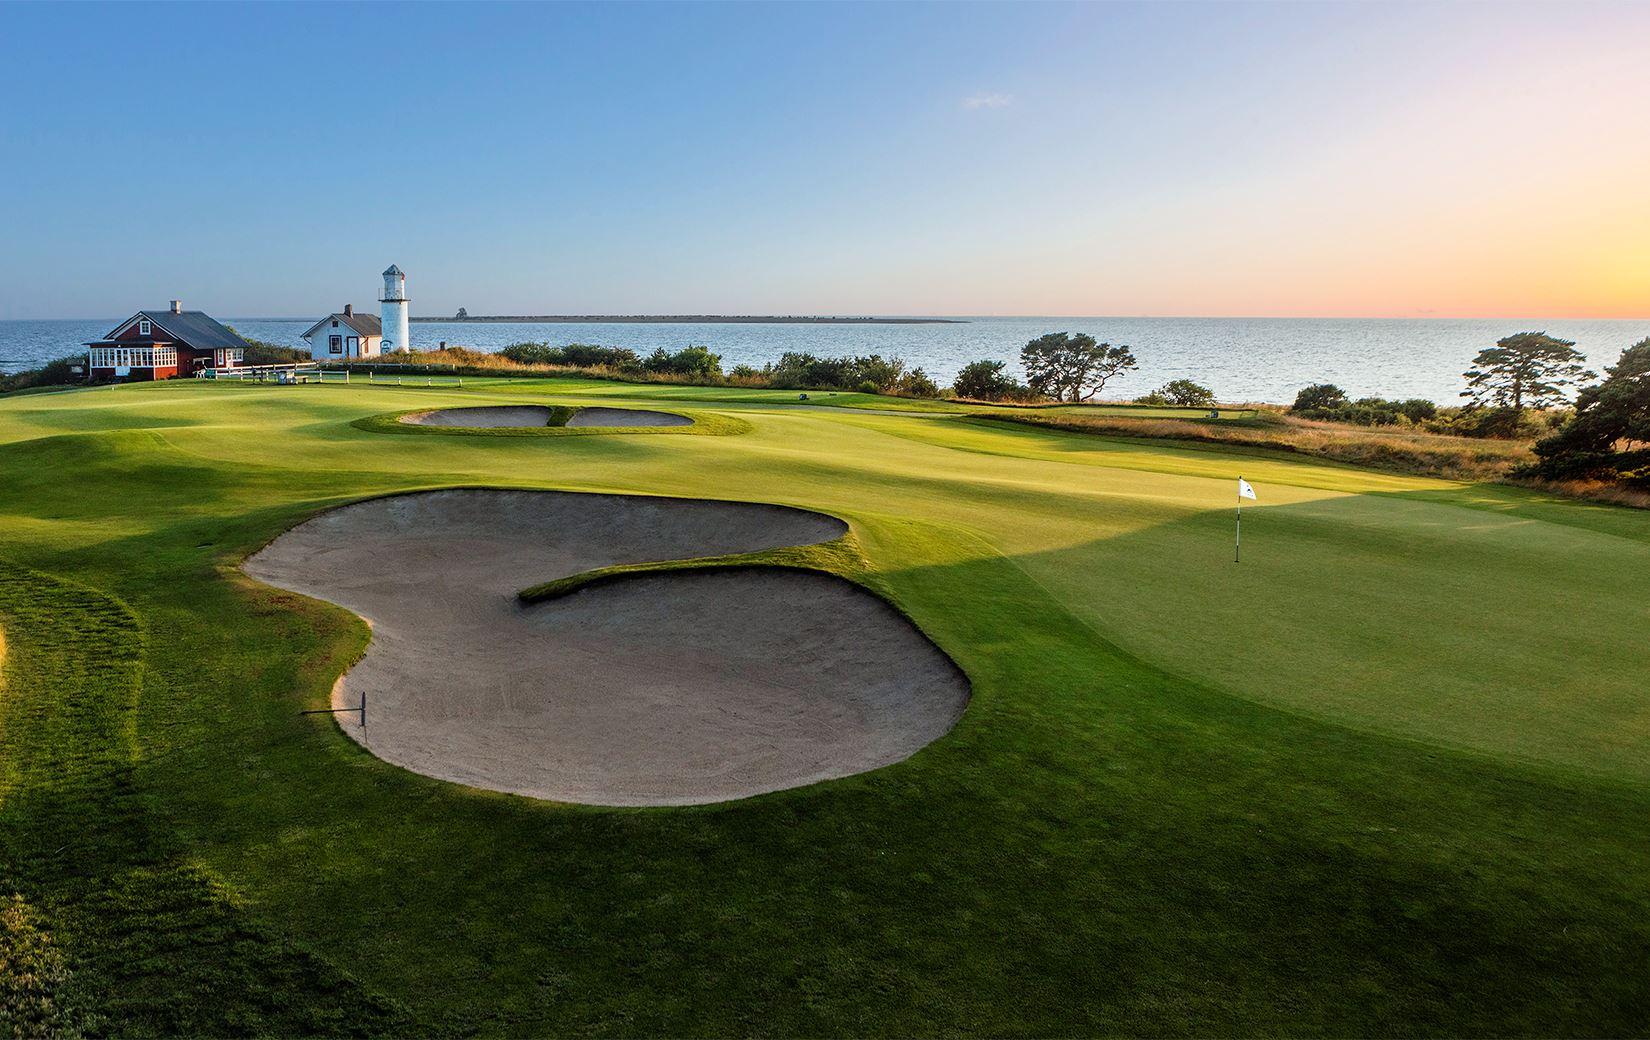 Golfa Runt Gotland 2018